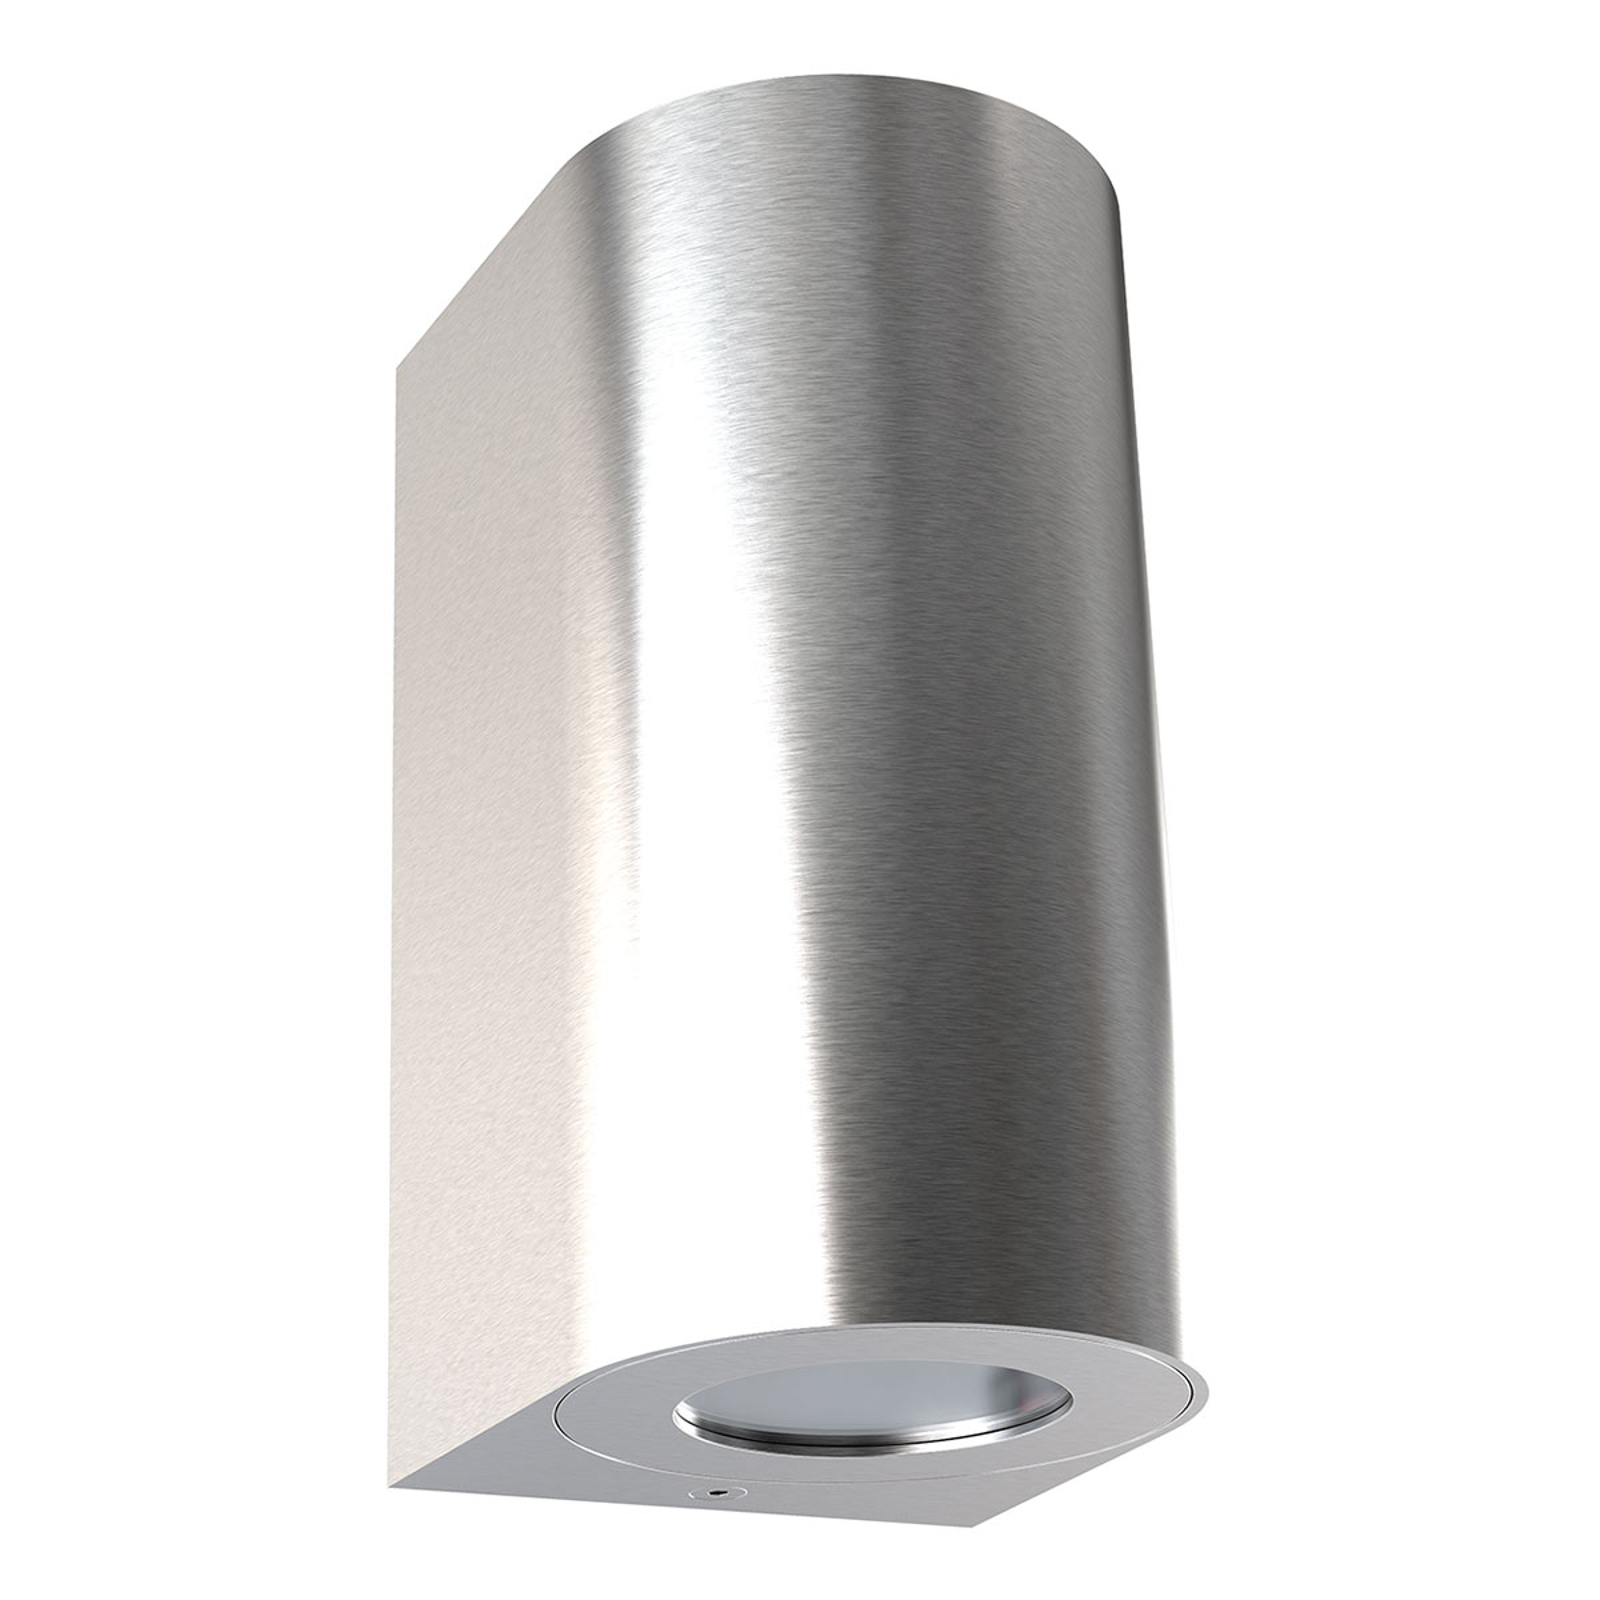 Applique da esterni Canto Maxi 2, acciaio inox